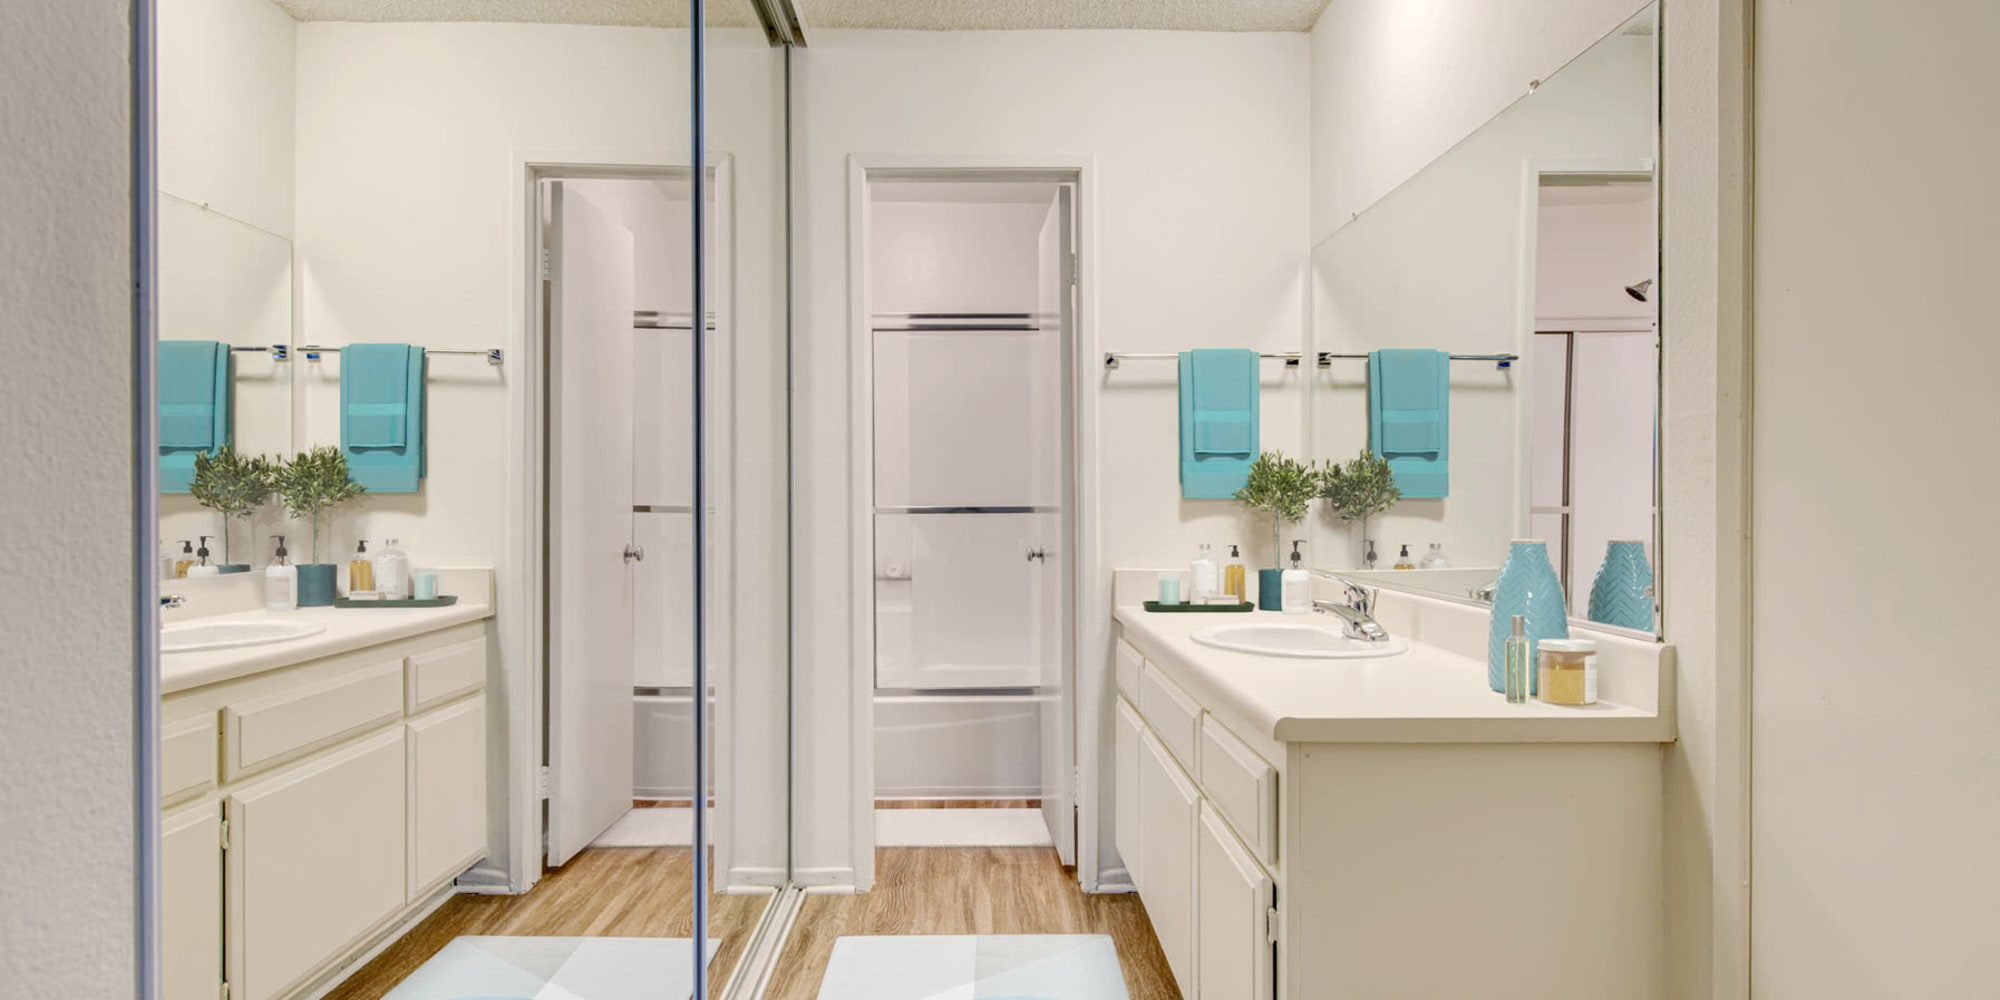 Mirrored closet doors in a model home's bathroom at Village Pointe in Northridge, California